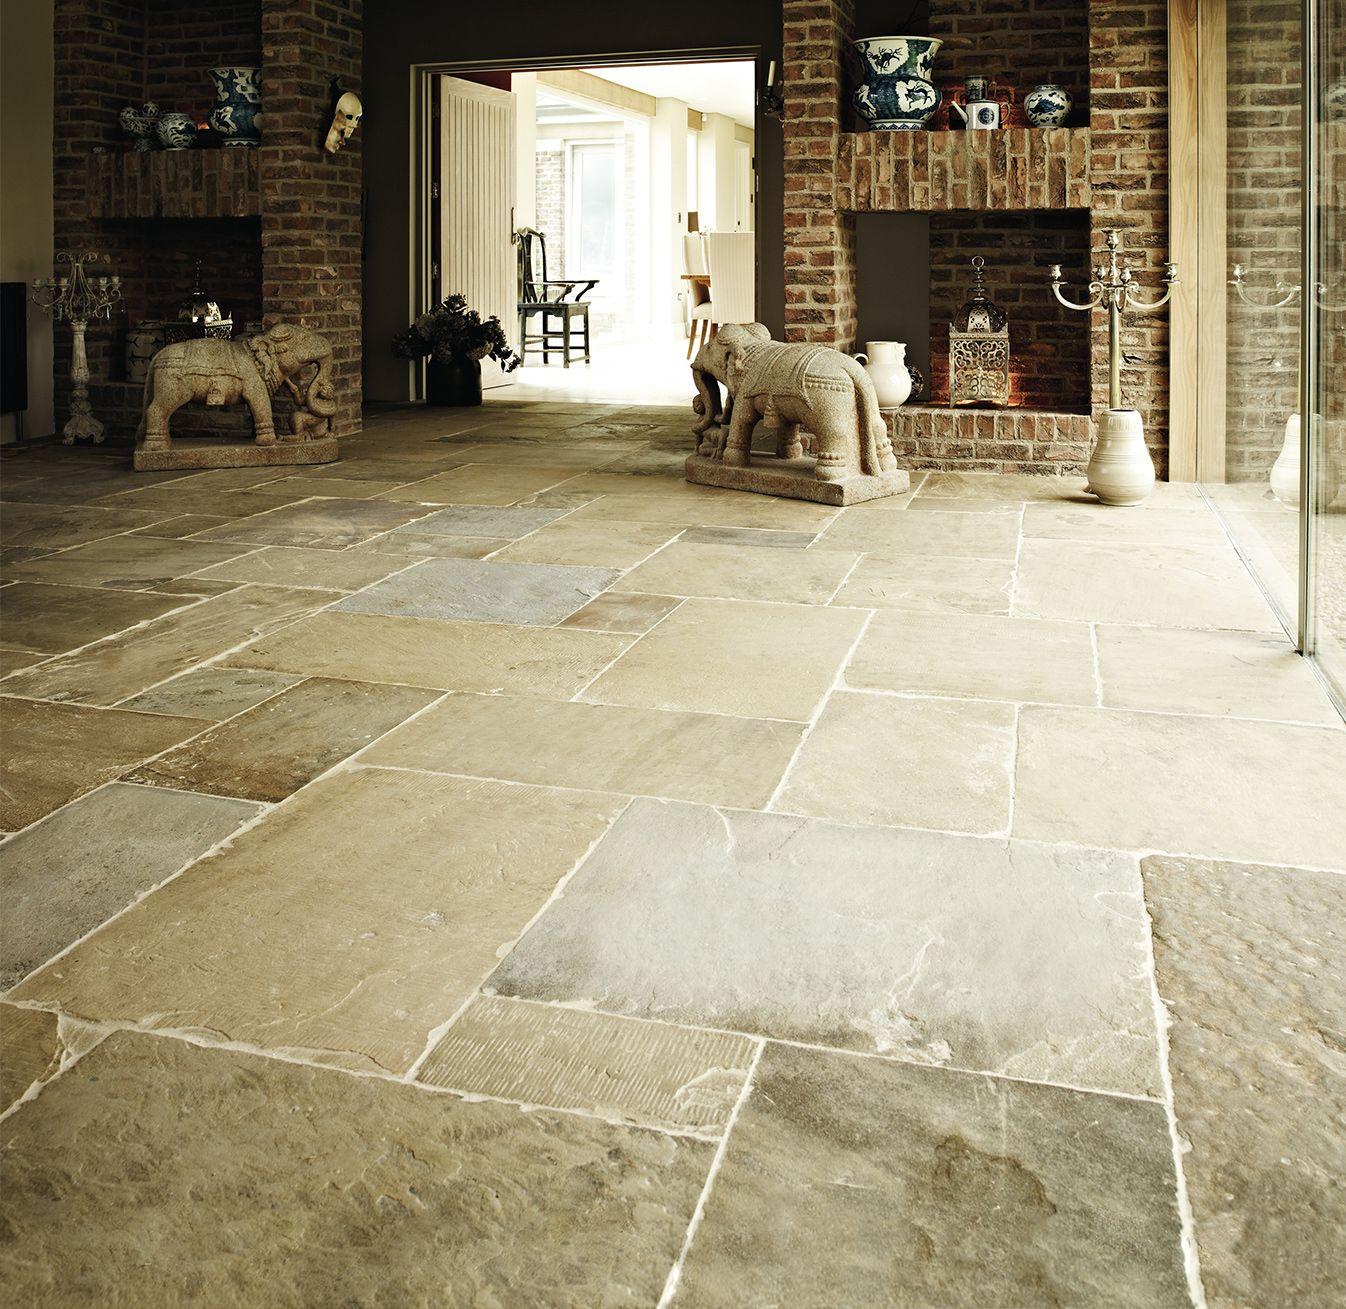 flagstone floor natural flagstone tile flooring design | kitchen